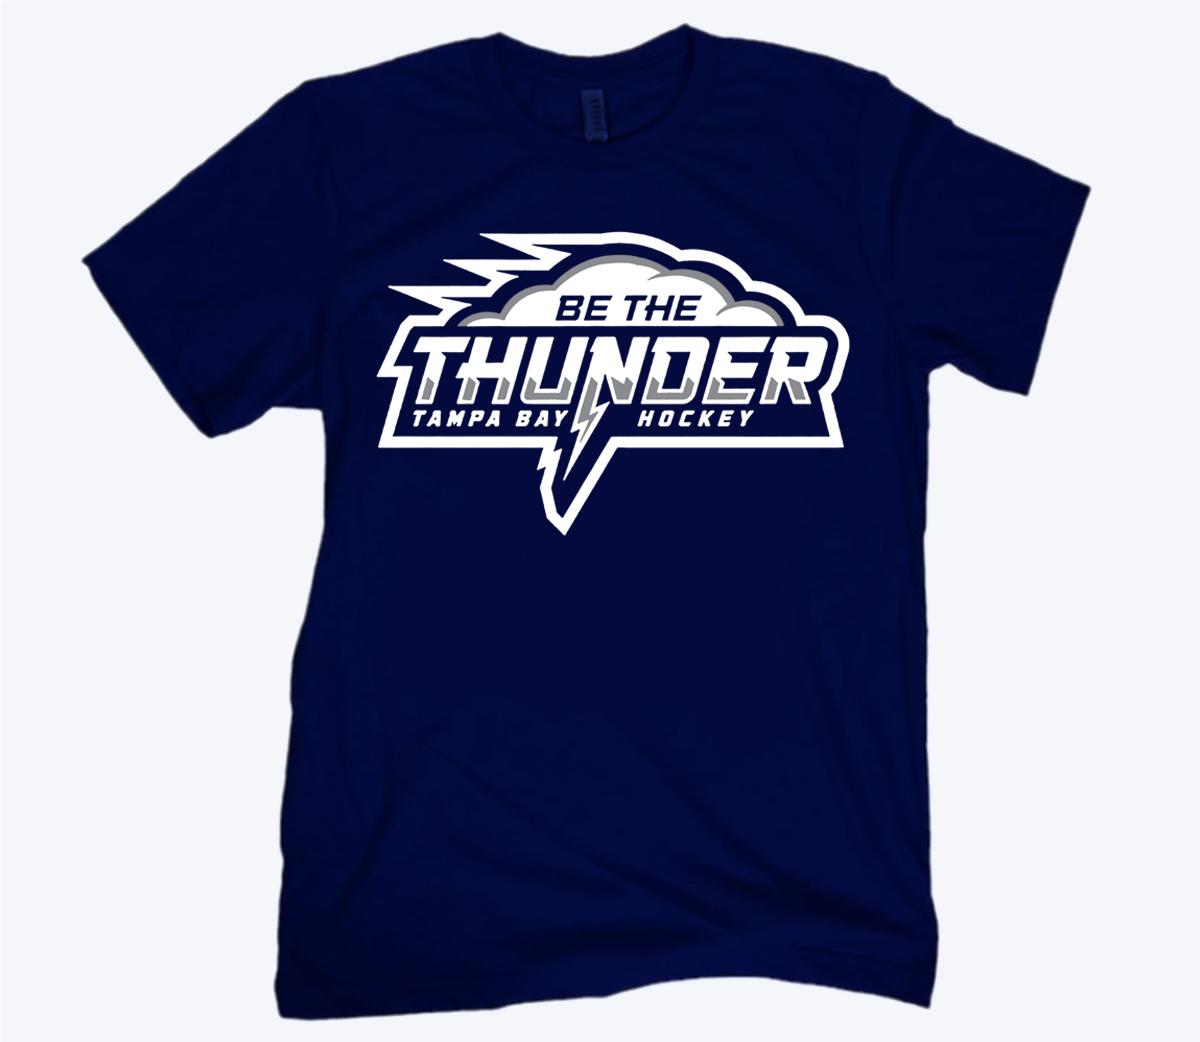 Be the Thunder T-Shirt - Tampa Bay Hockey